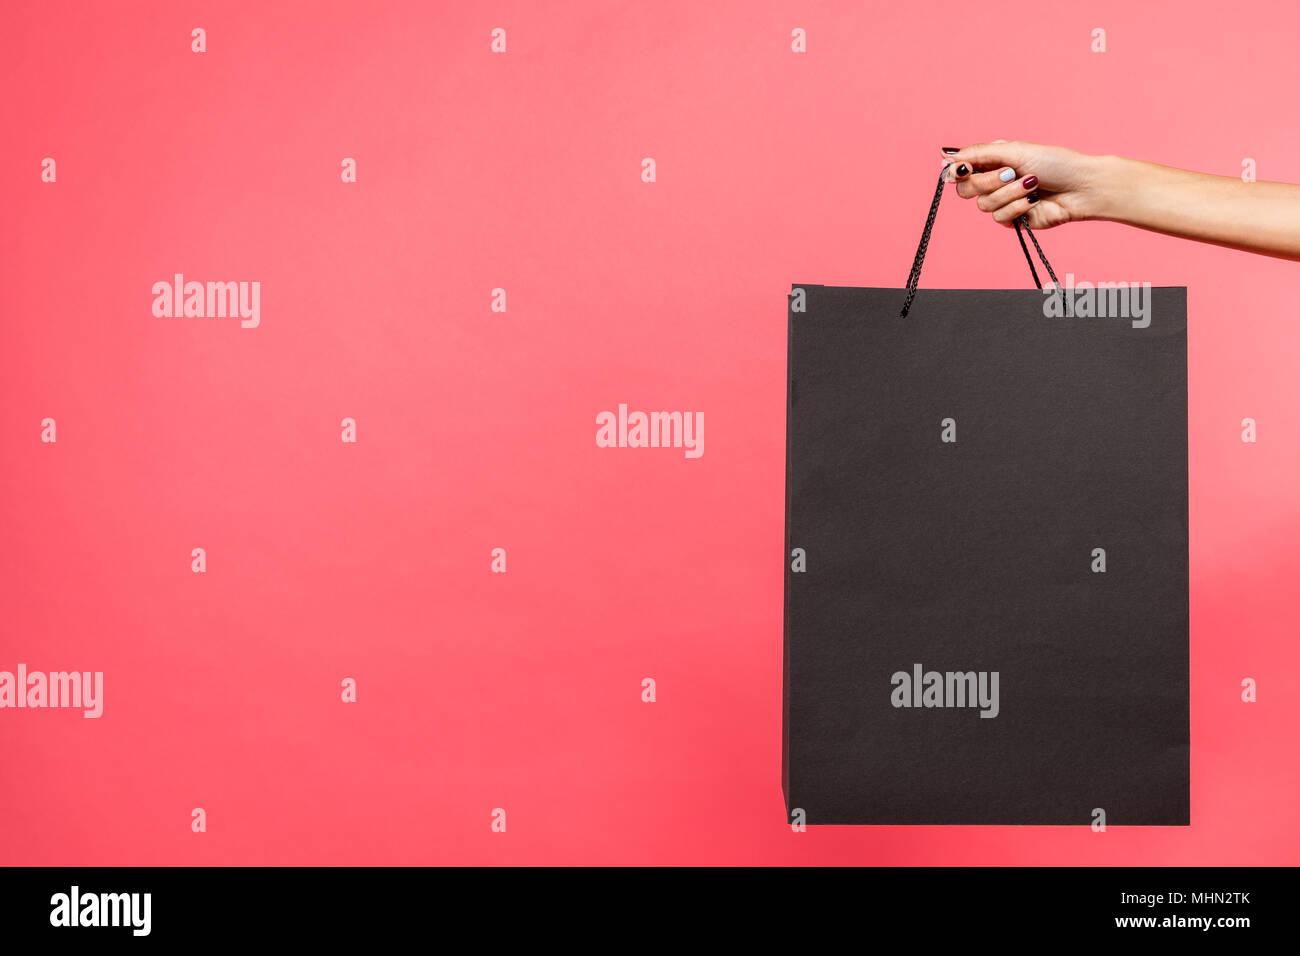 woman holding black shopping bag - Stock Image